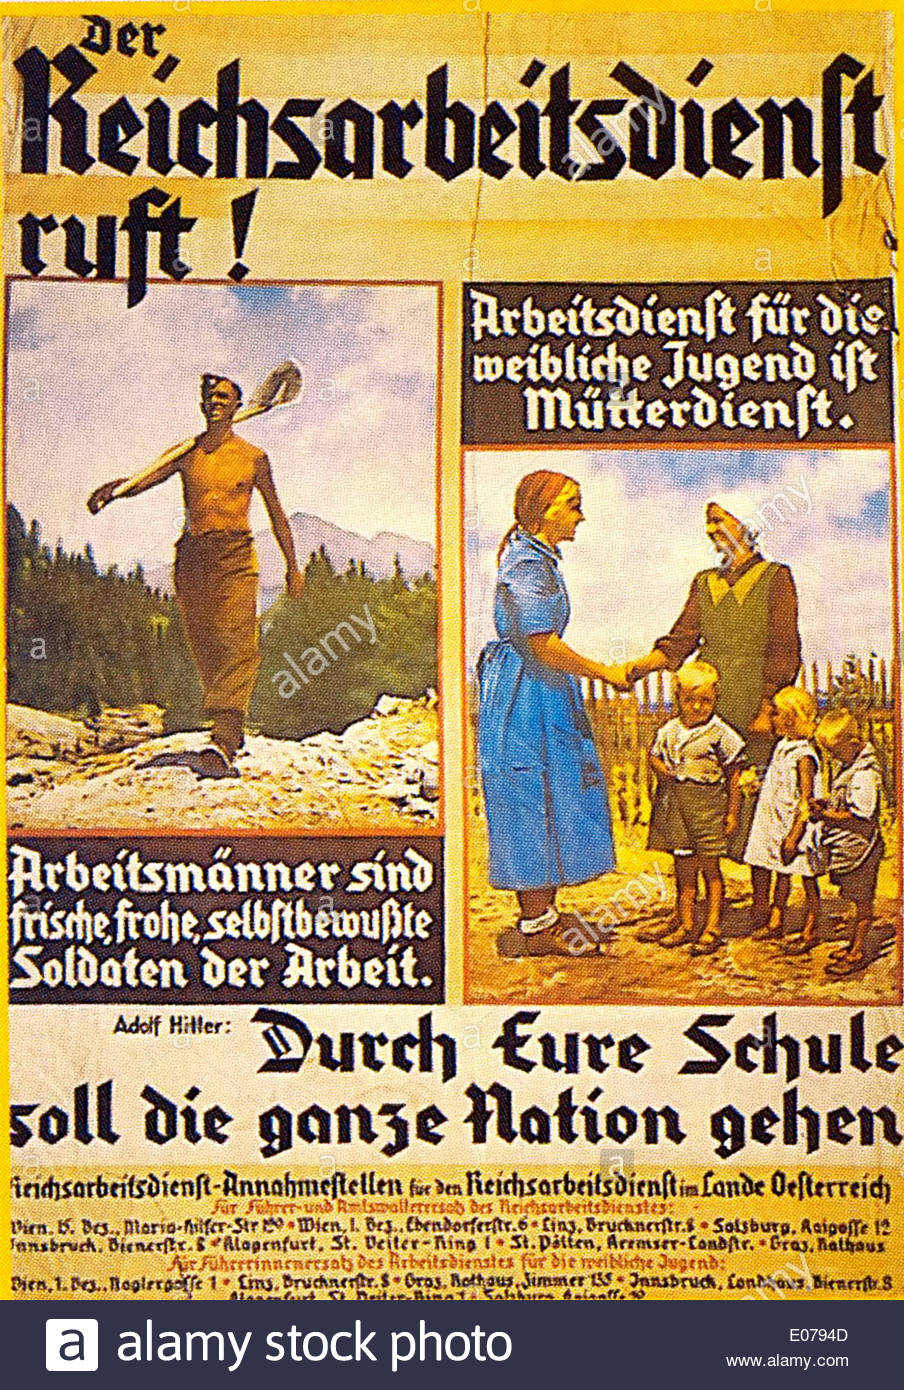 Nazi German propaganda wartime poster - Stock Image